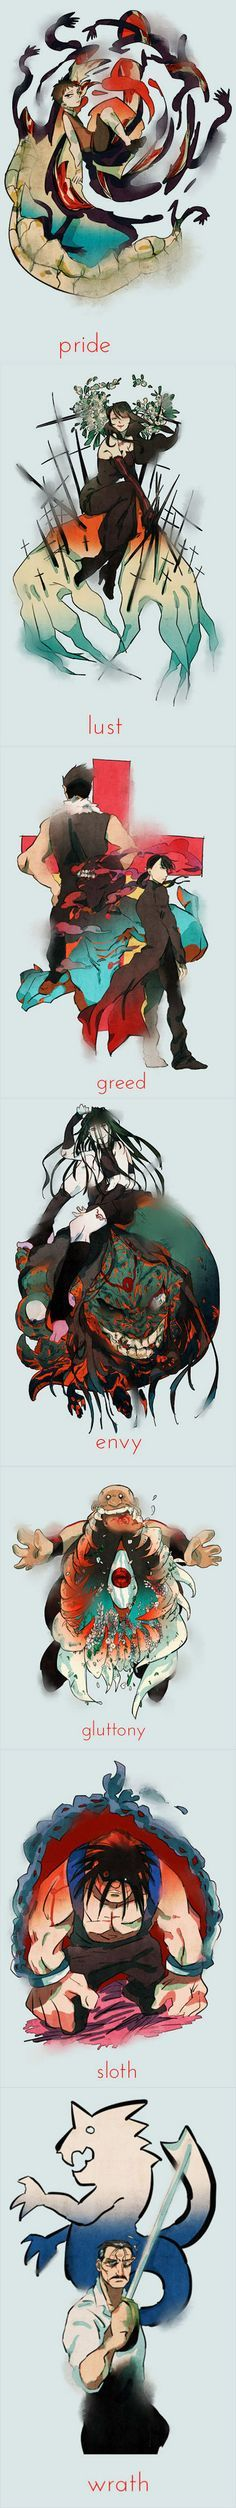 Fullmetal Alchemist - the Seven Deadly Sins - homunculi ...